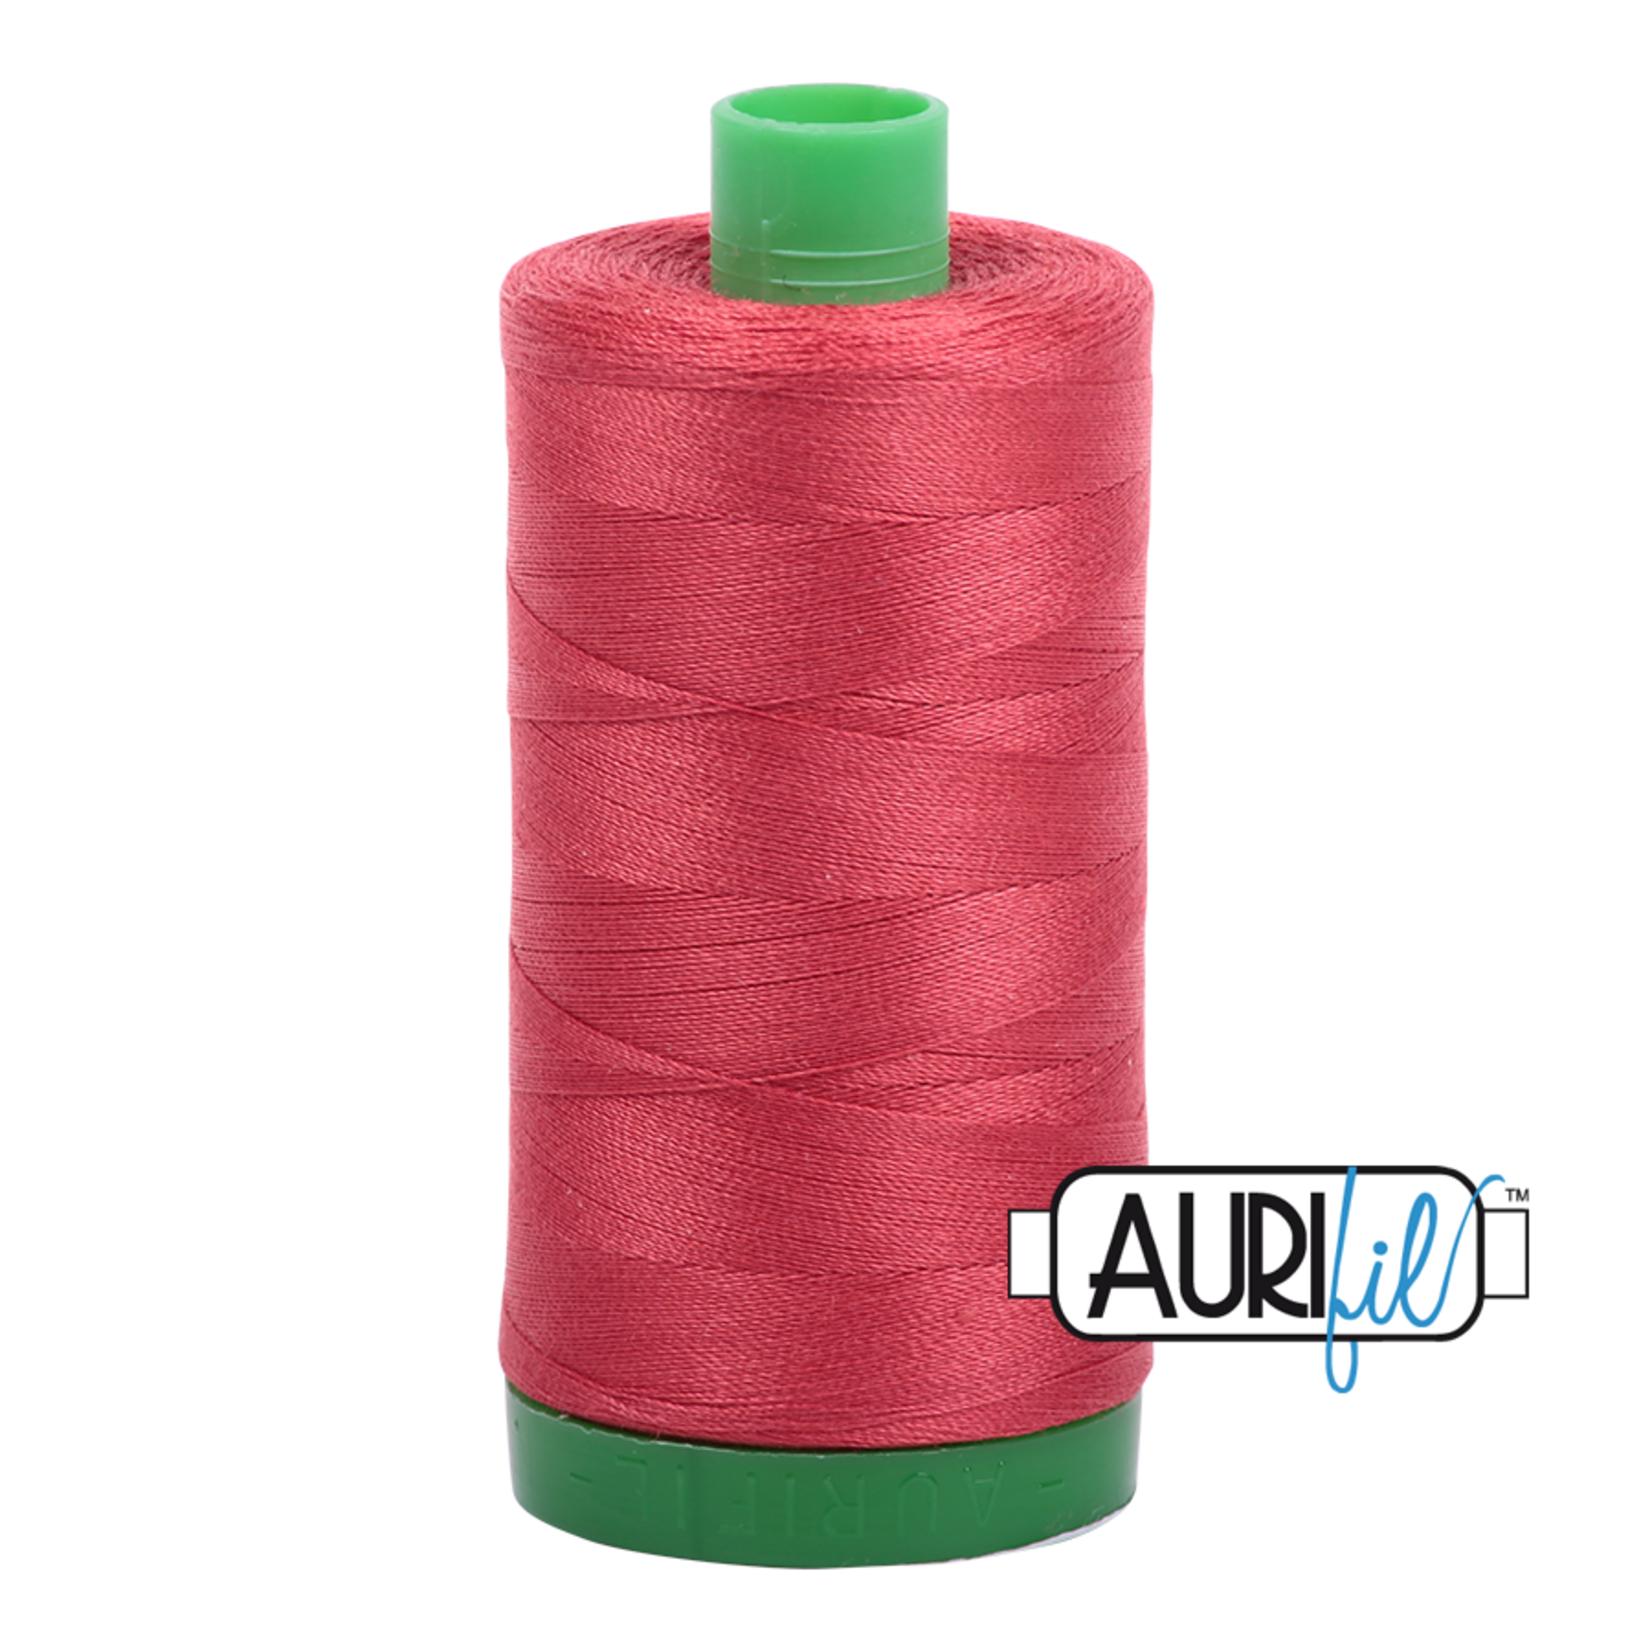 AURIFIL AURIFIL 40 WT Red Peony 2230